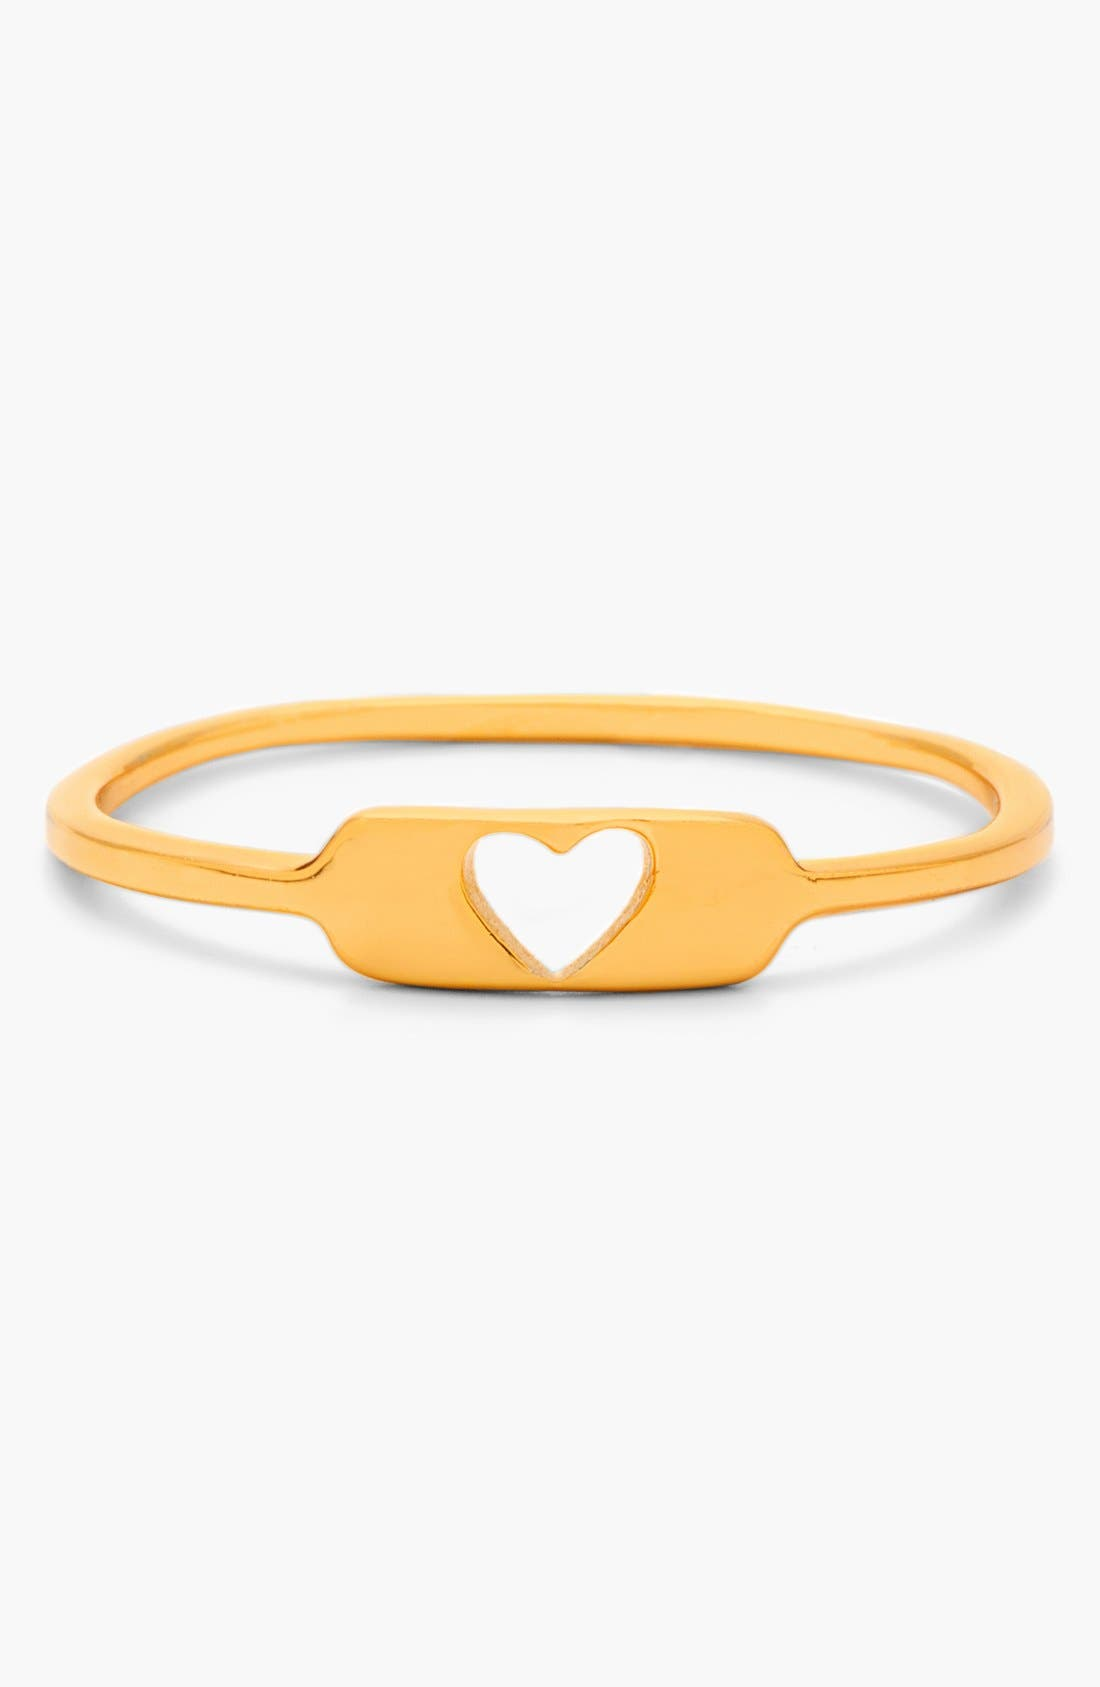 Alternate Image 1 Selected - gorjana 'Cutout Heart' Ring